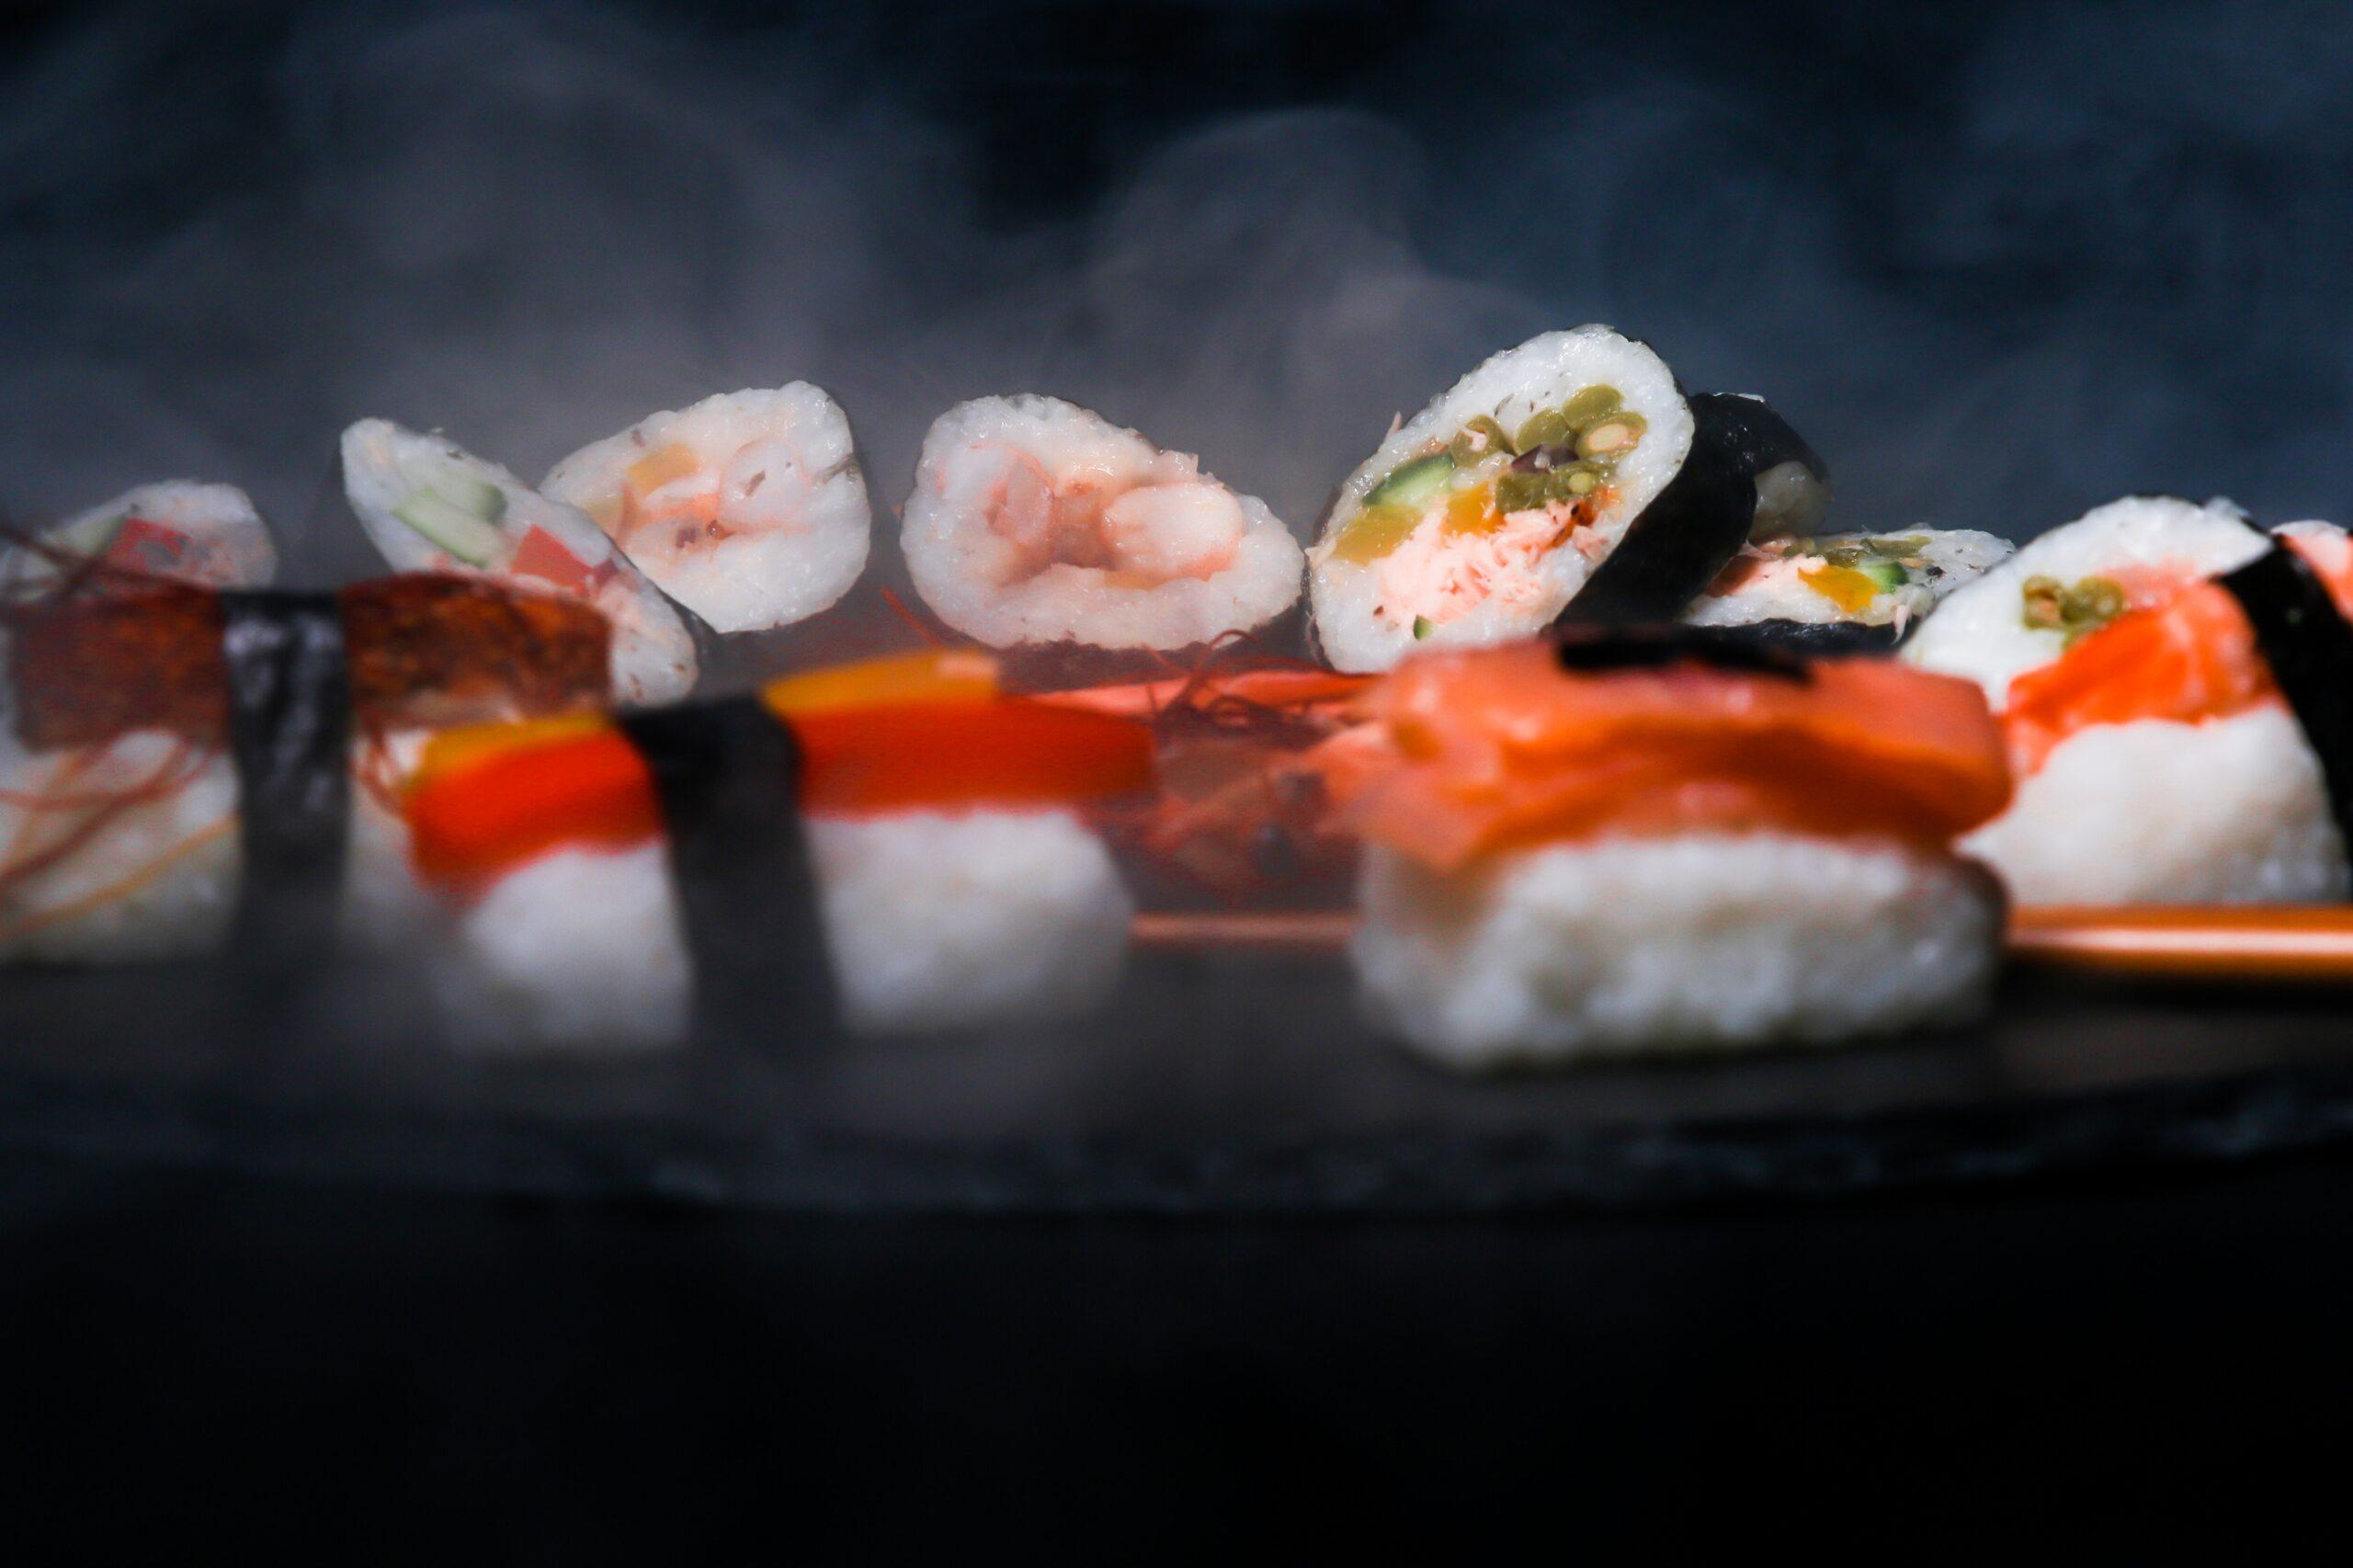 fresquito-tinaja-sushi-3687447